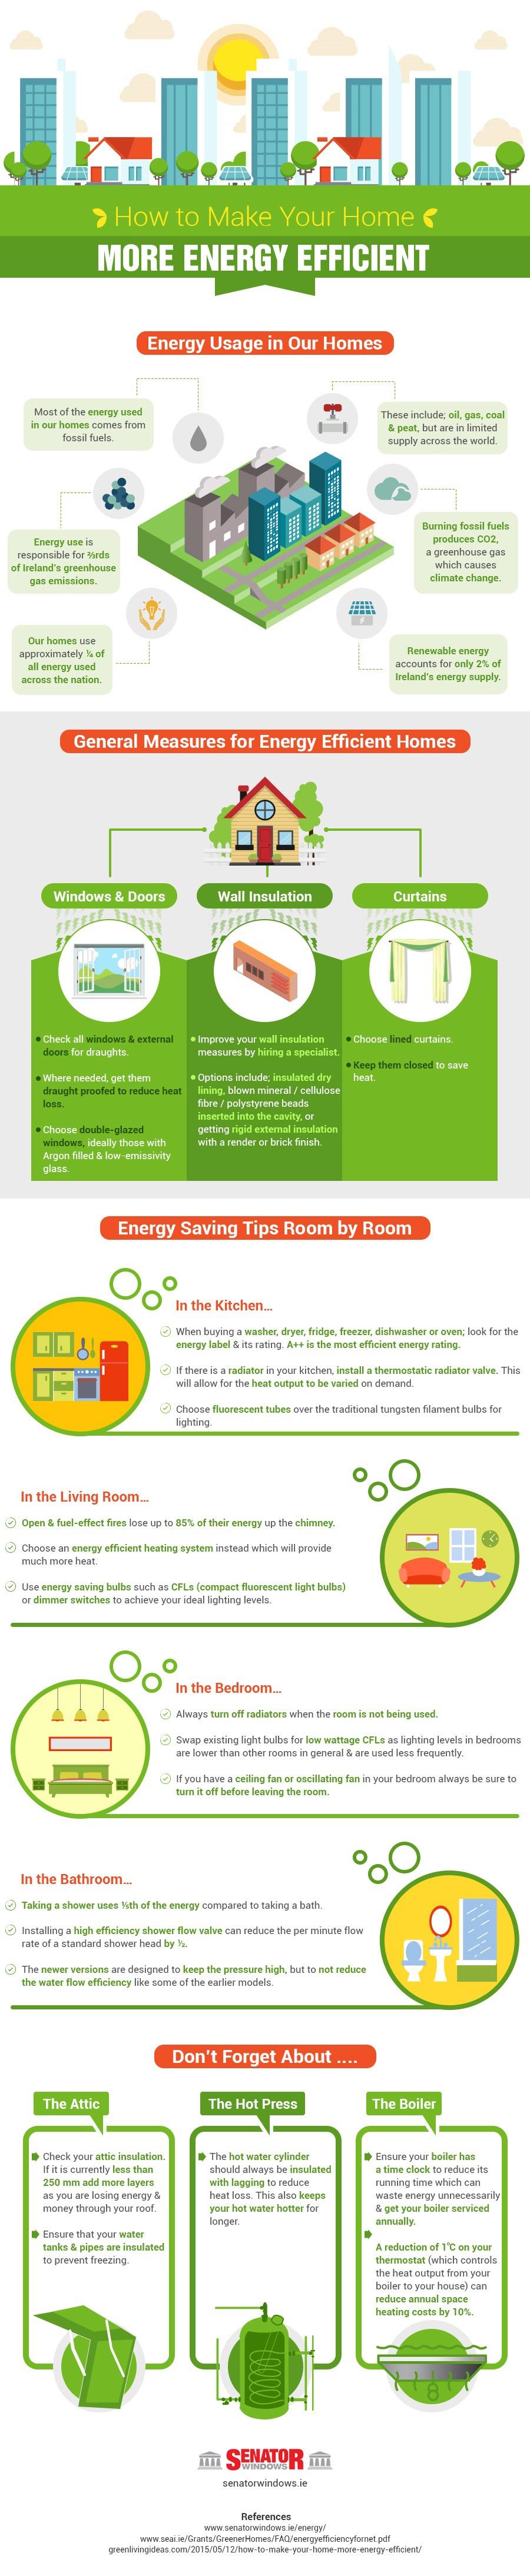 senator-windows-energy-efficiency-ig